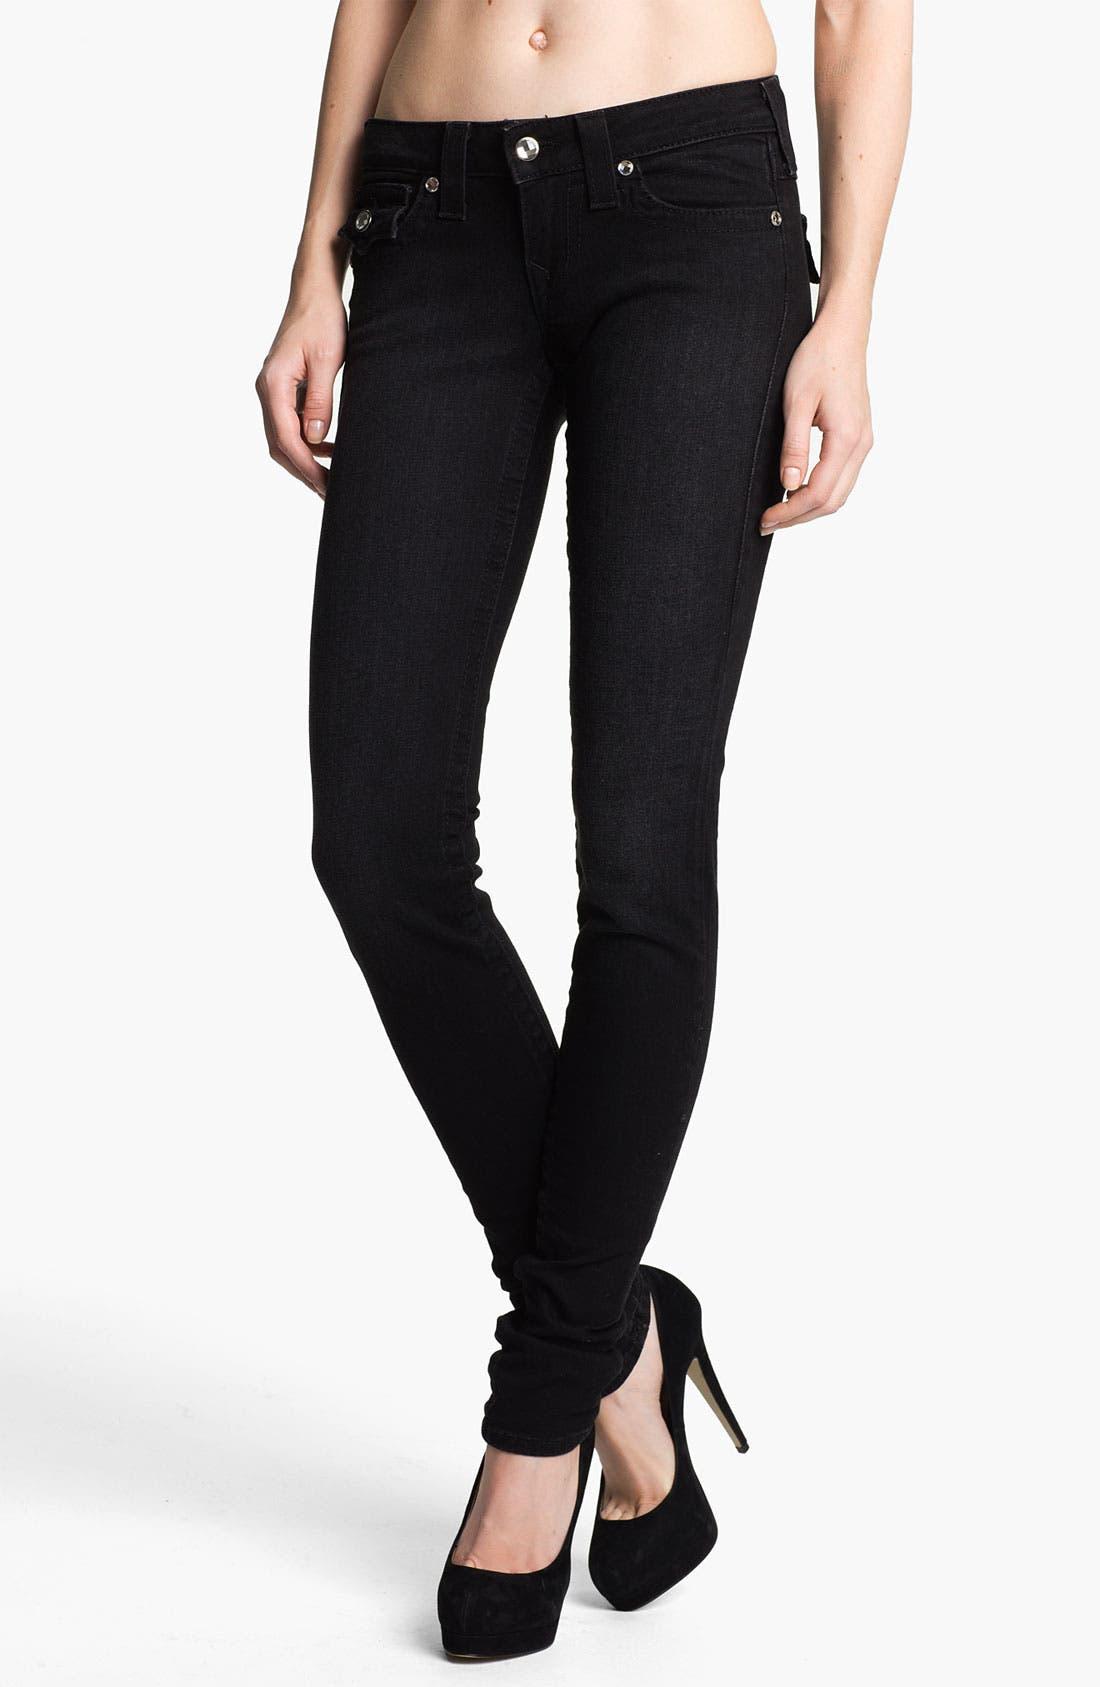 Alternate Image 1 Selected - True Religion Brand Jeans 'Julie' Crystal Button Skinny Jeans (Lonestar)